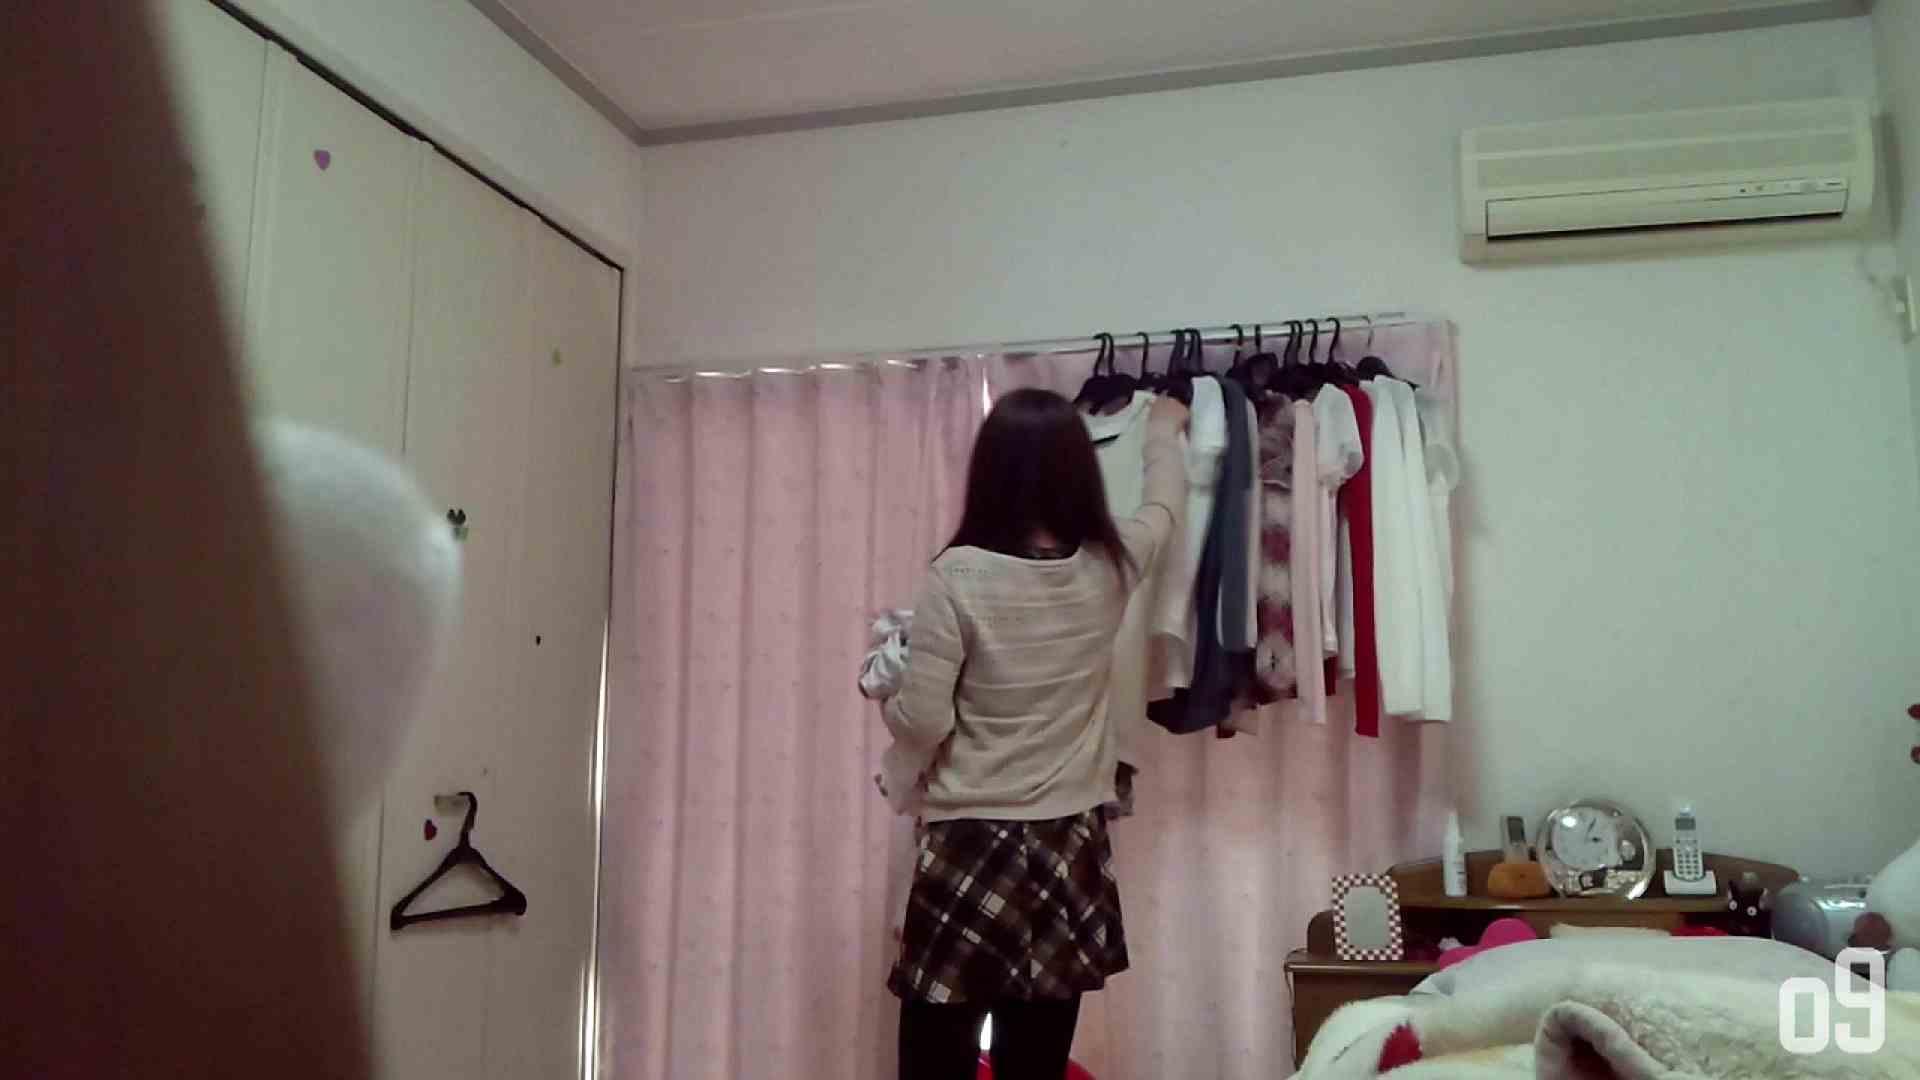 vol.2 瑞希ちゃんの自宅公開!寝起きの着替え・・・ラリルそー OLヌード天国  94PIX 90